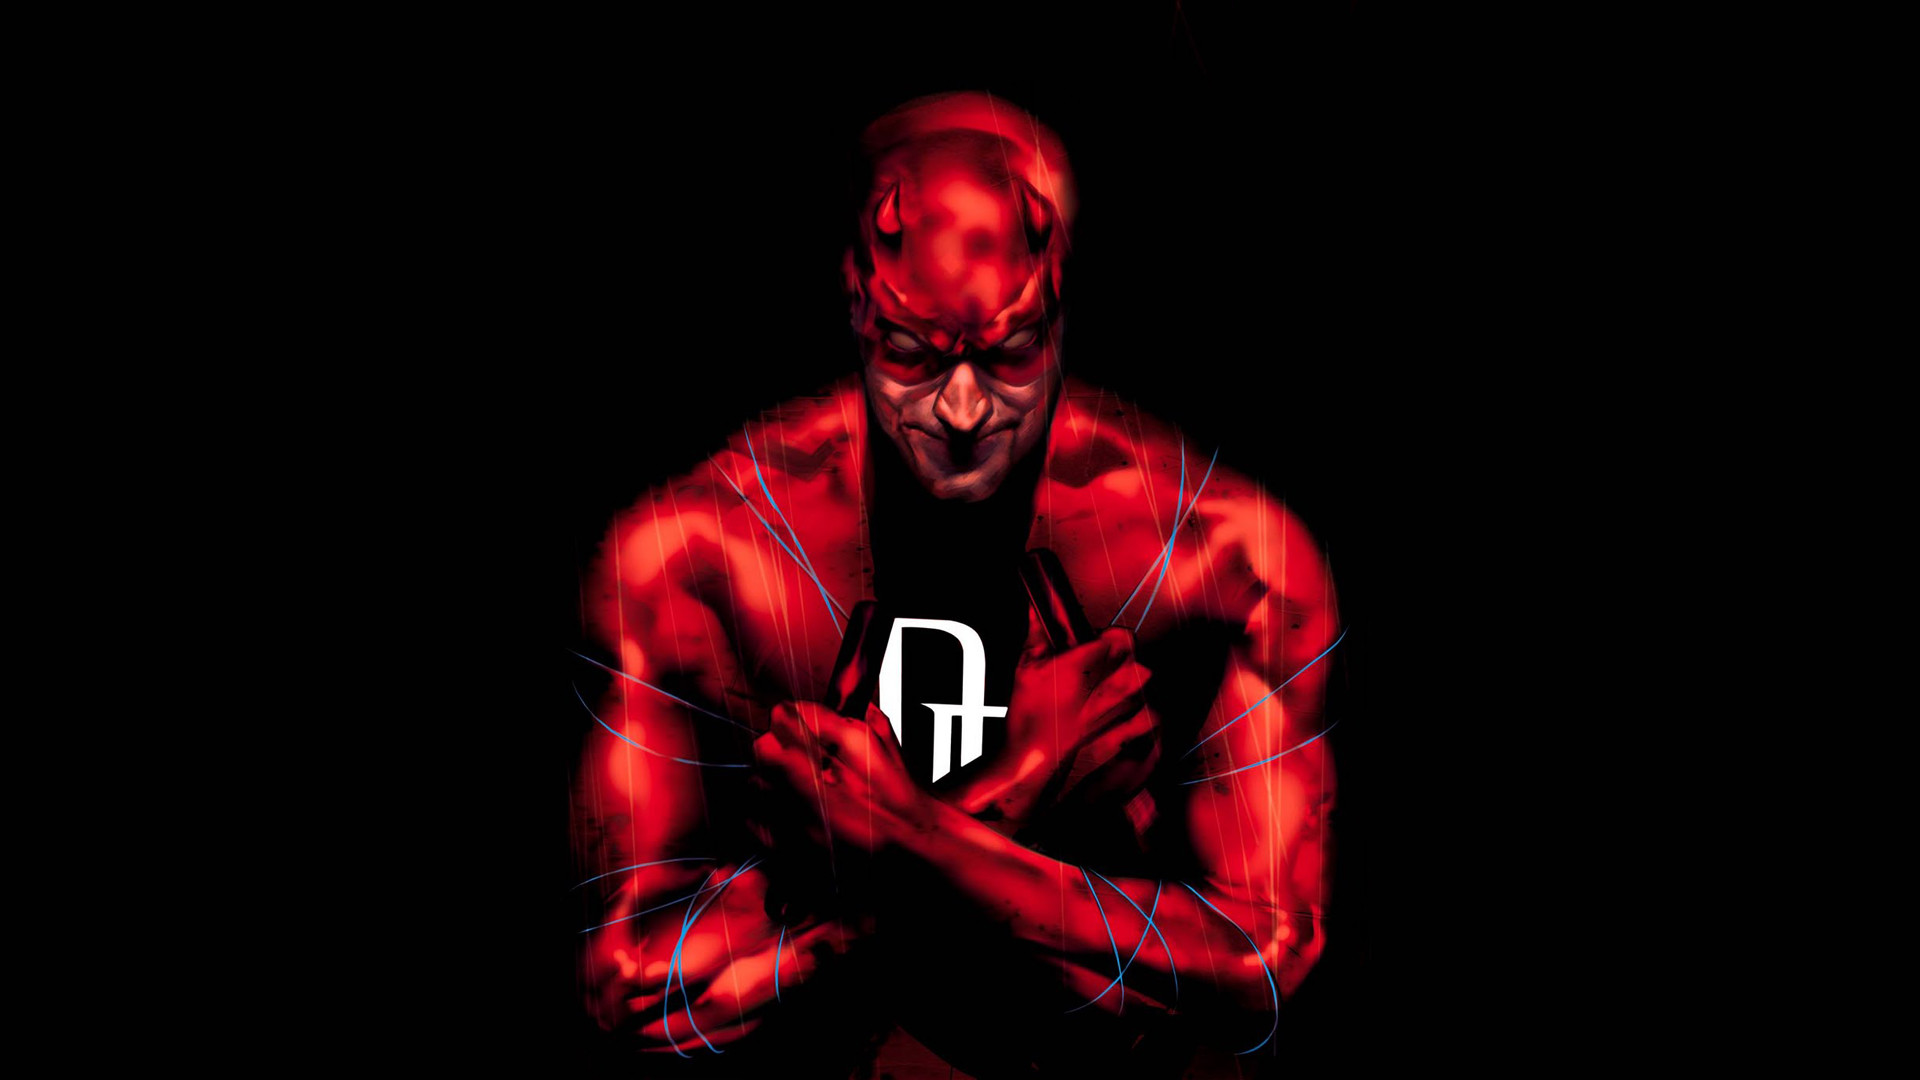 … Background Full HD 1080p. Wallpaper daredevil, art, marvel  comics